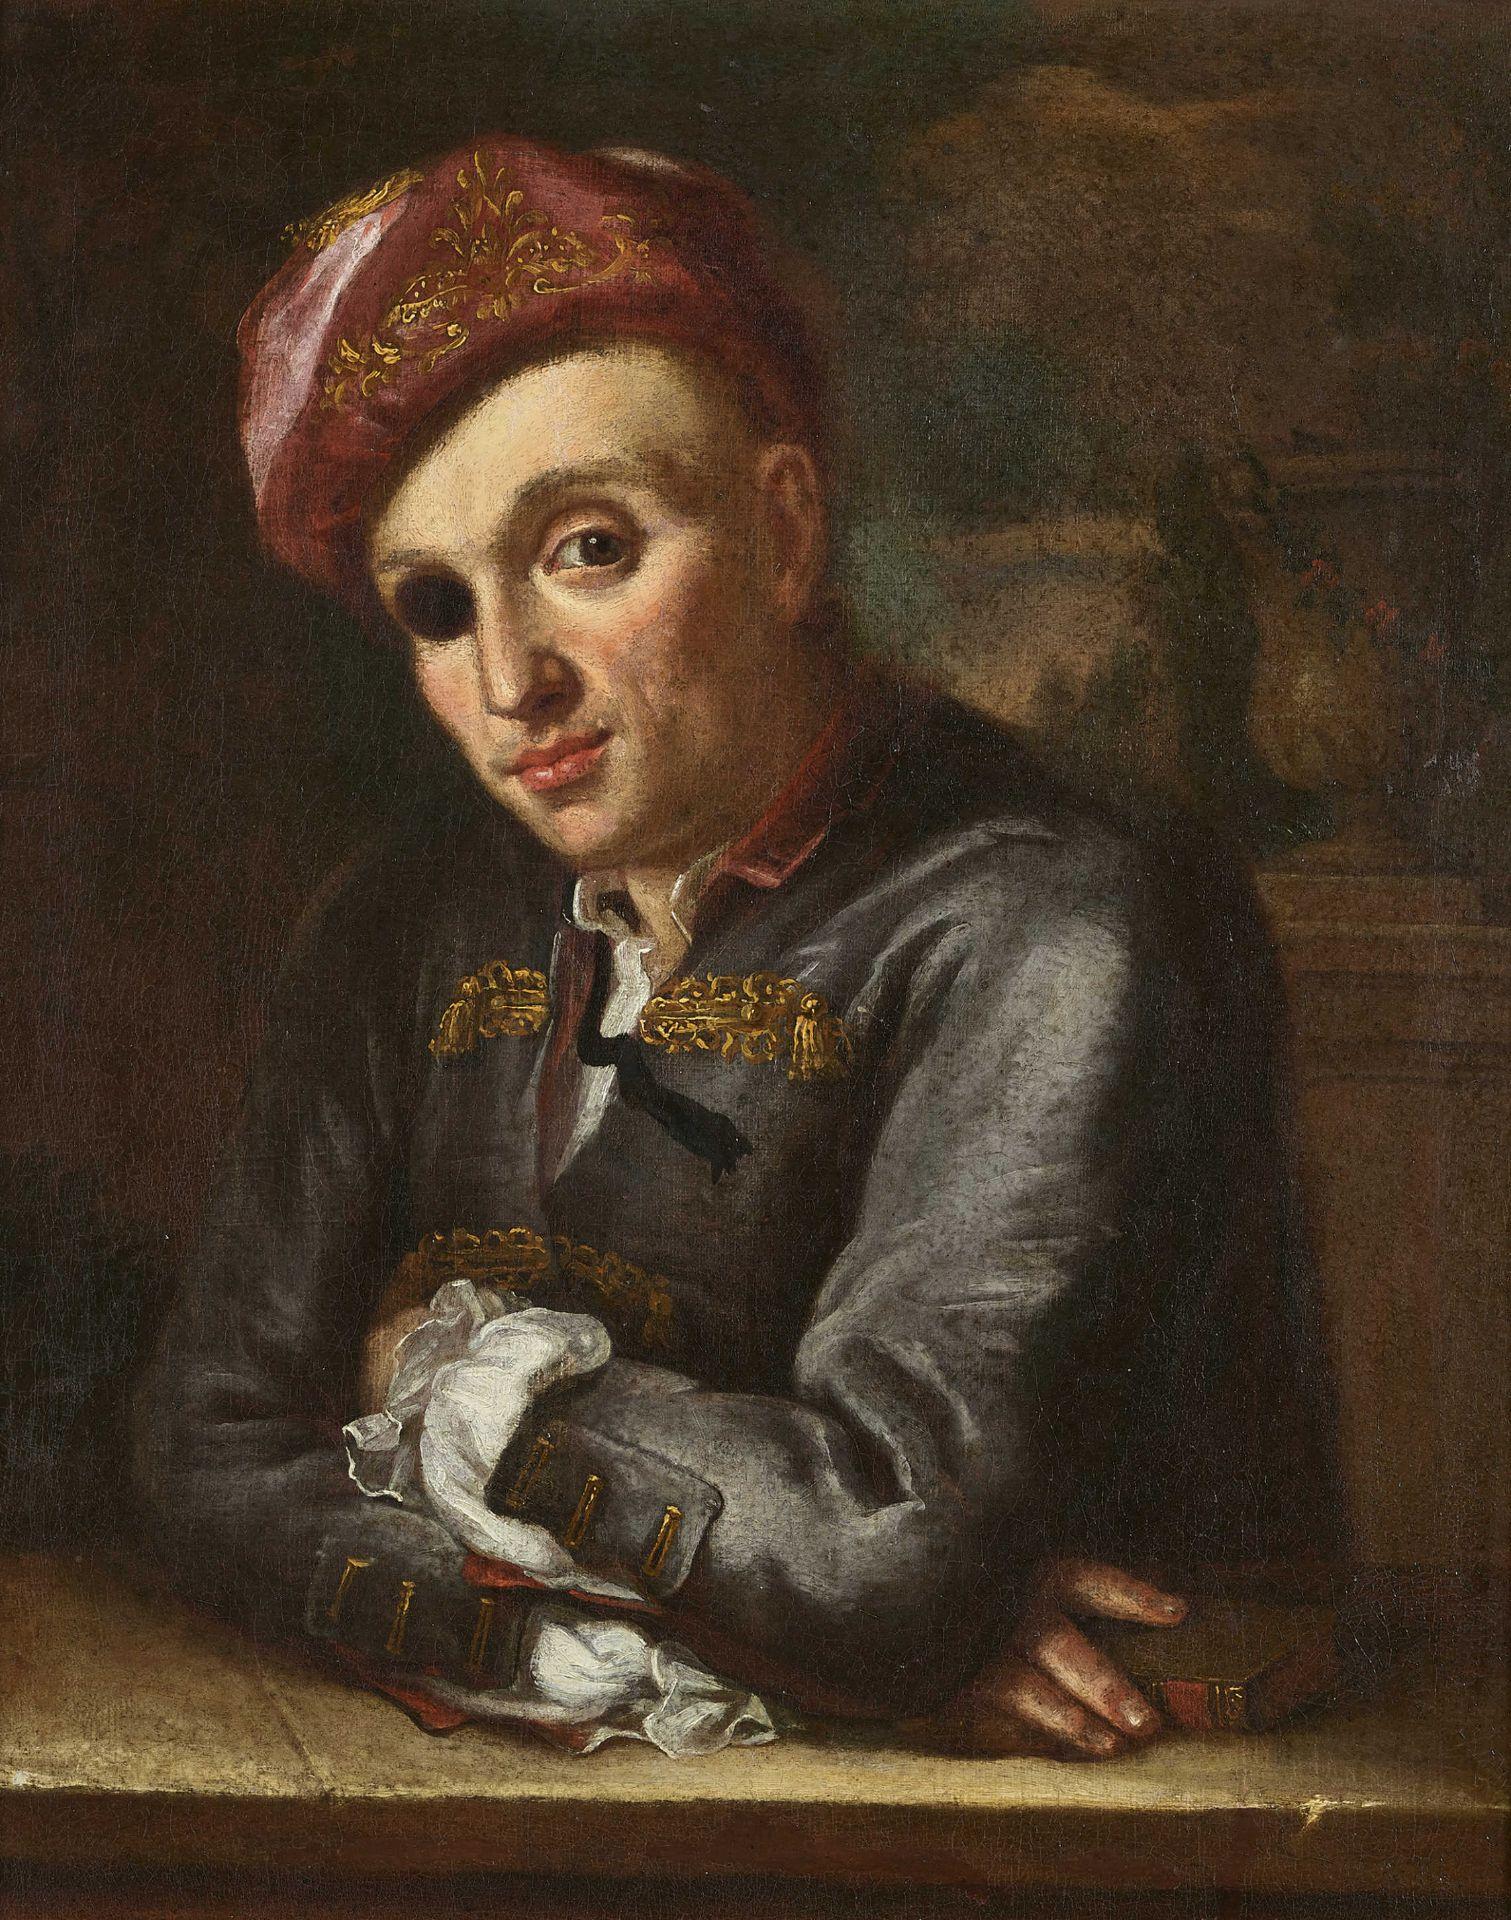 HANDMANN, JAKOB EMANUEL, Umkreis - Circle: Porträt von Johann Rudolf Sinner (1702-1782).